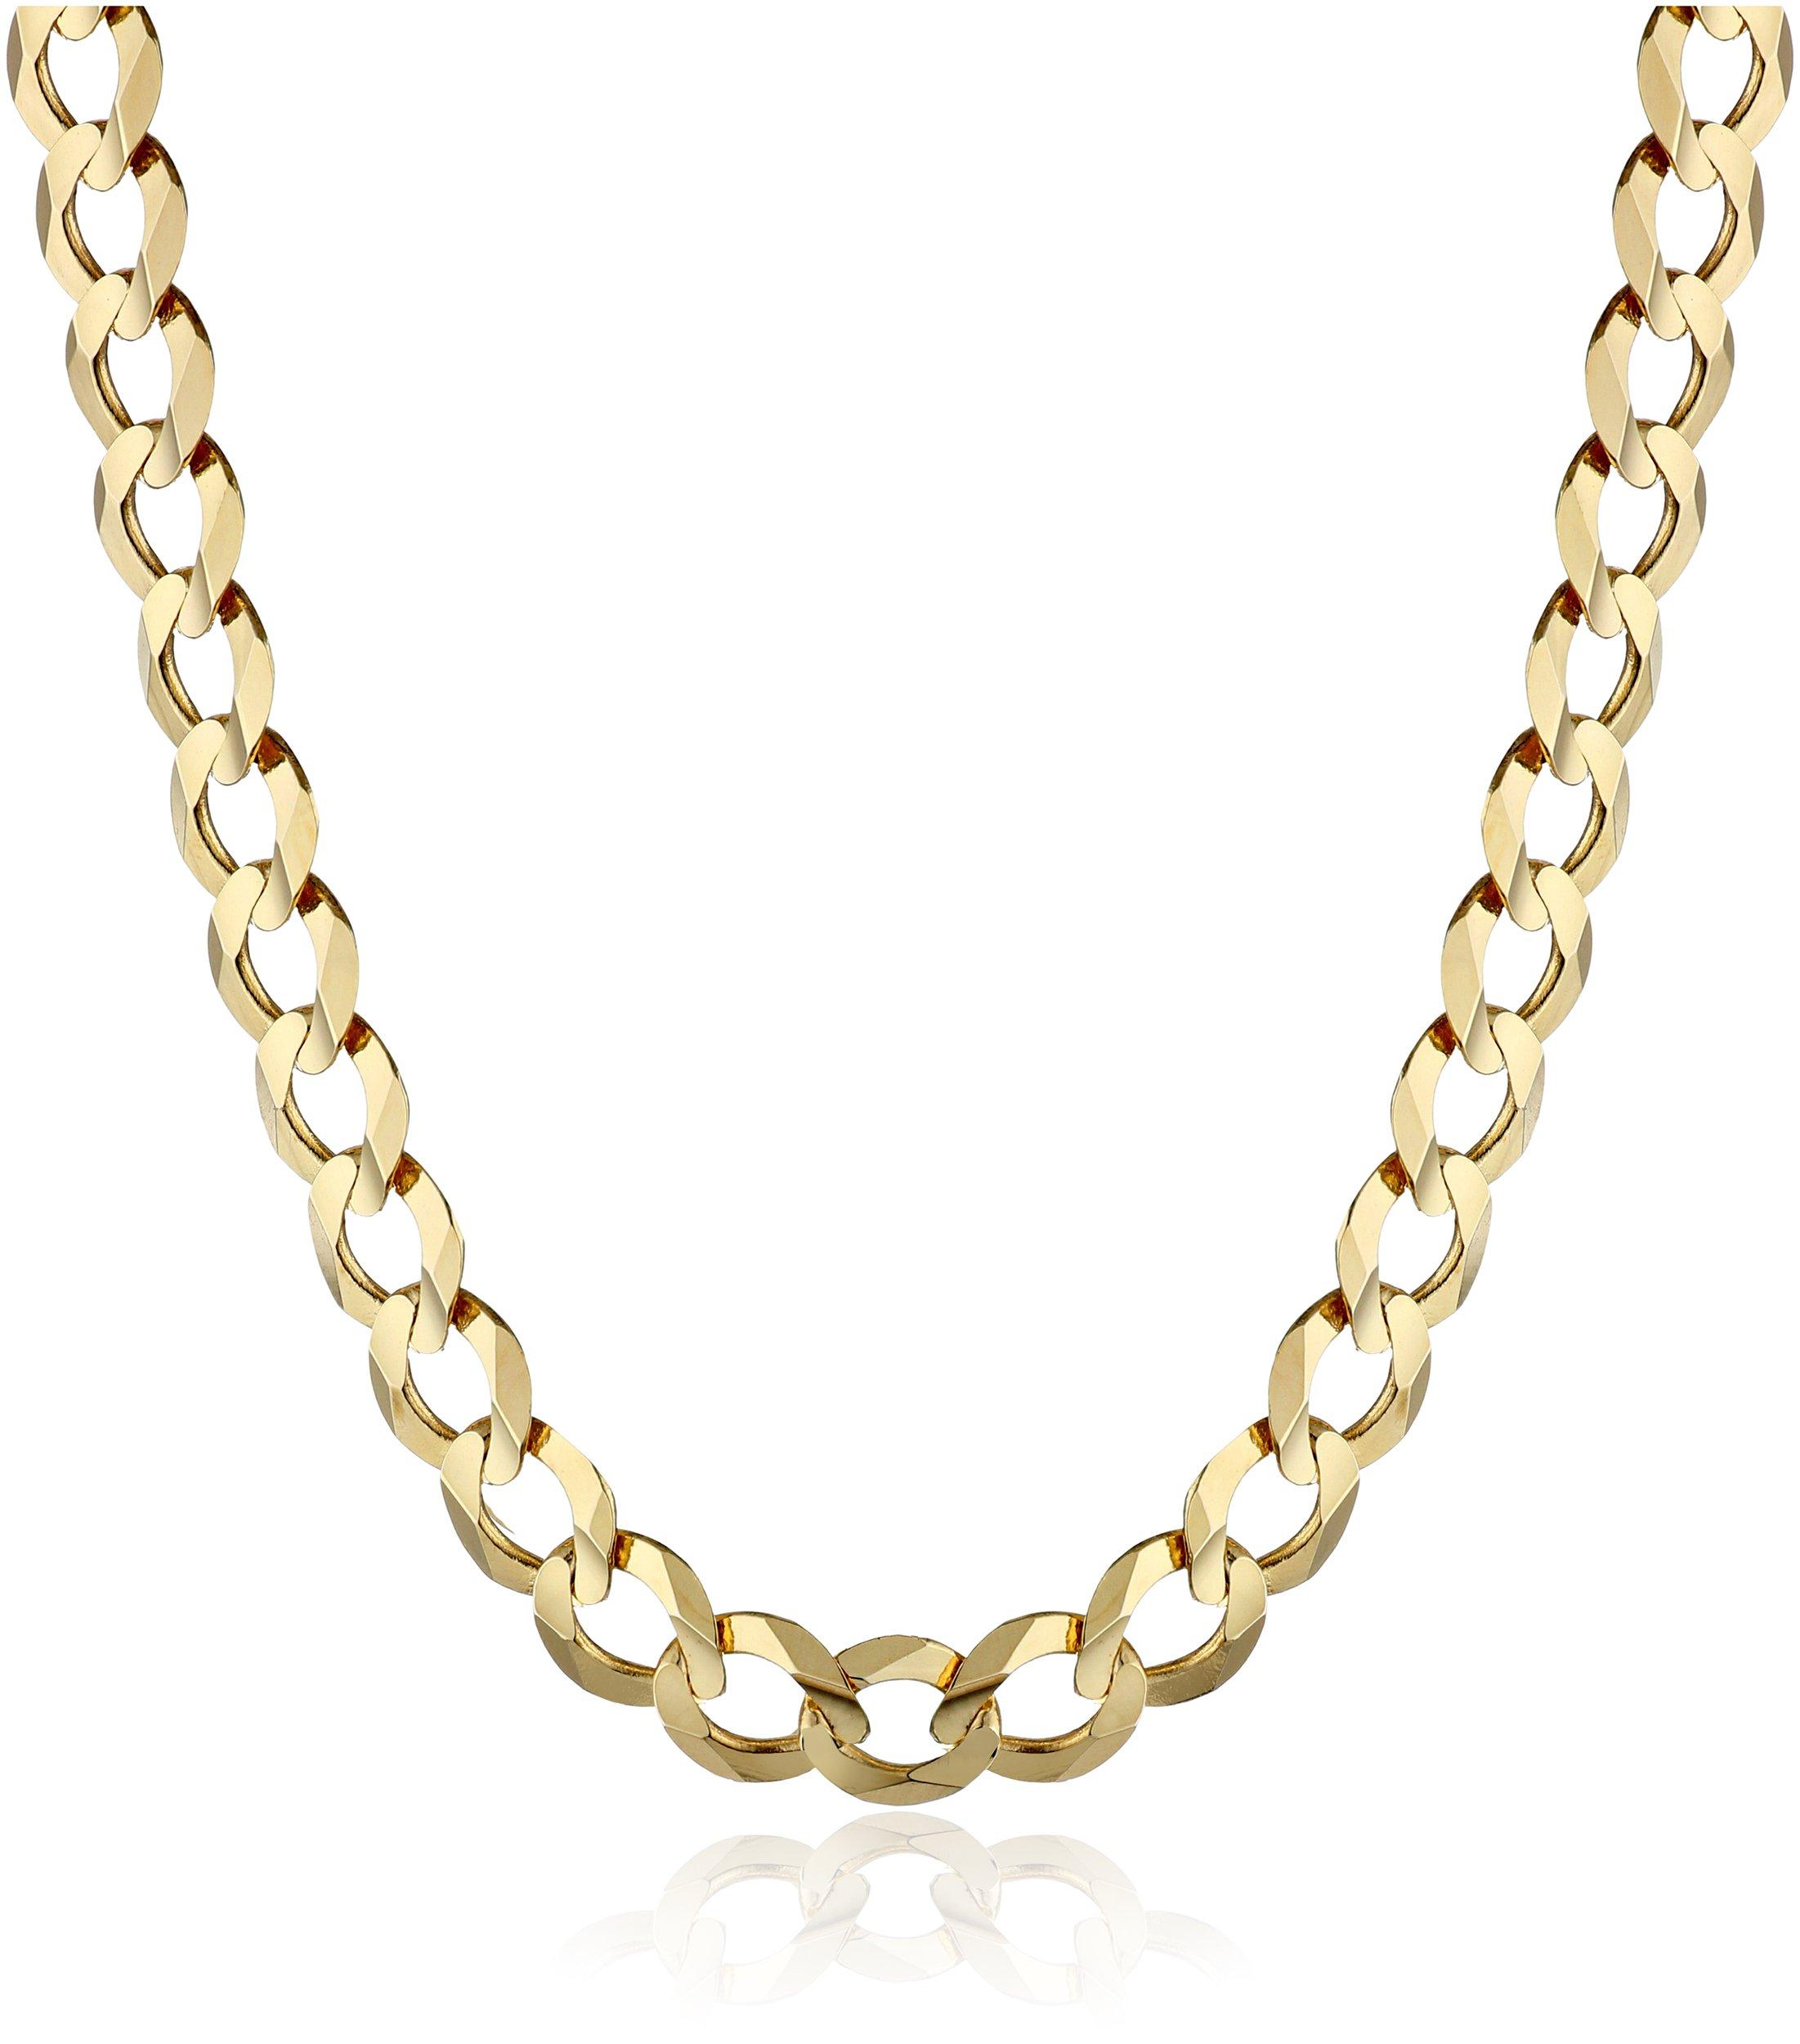 Men's 14k Yellow Gold 5.7mm Cuban Chain Necklace, 22''